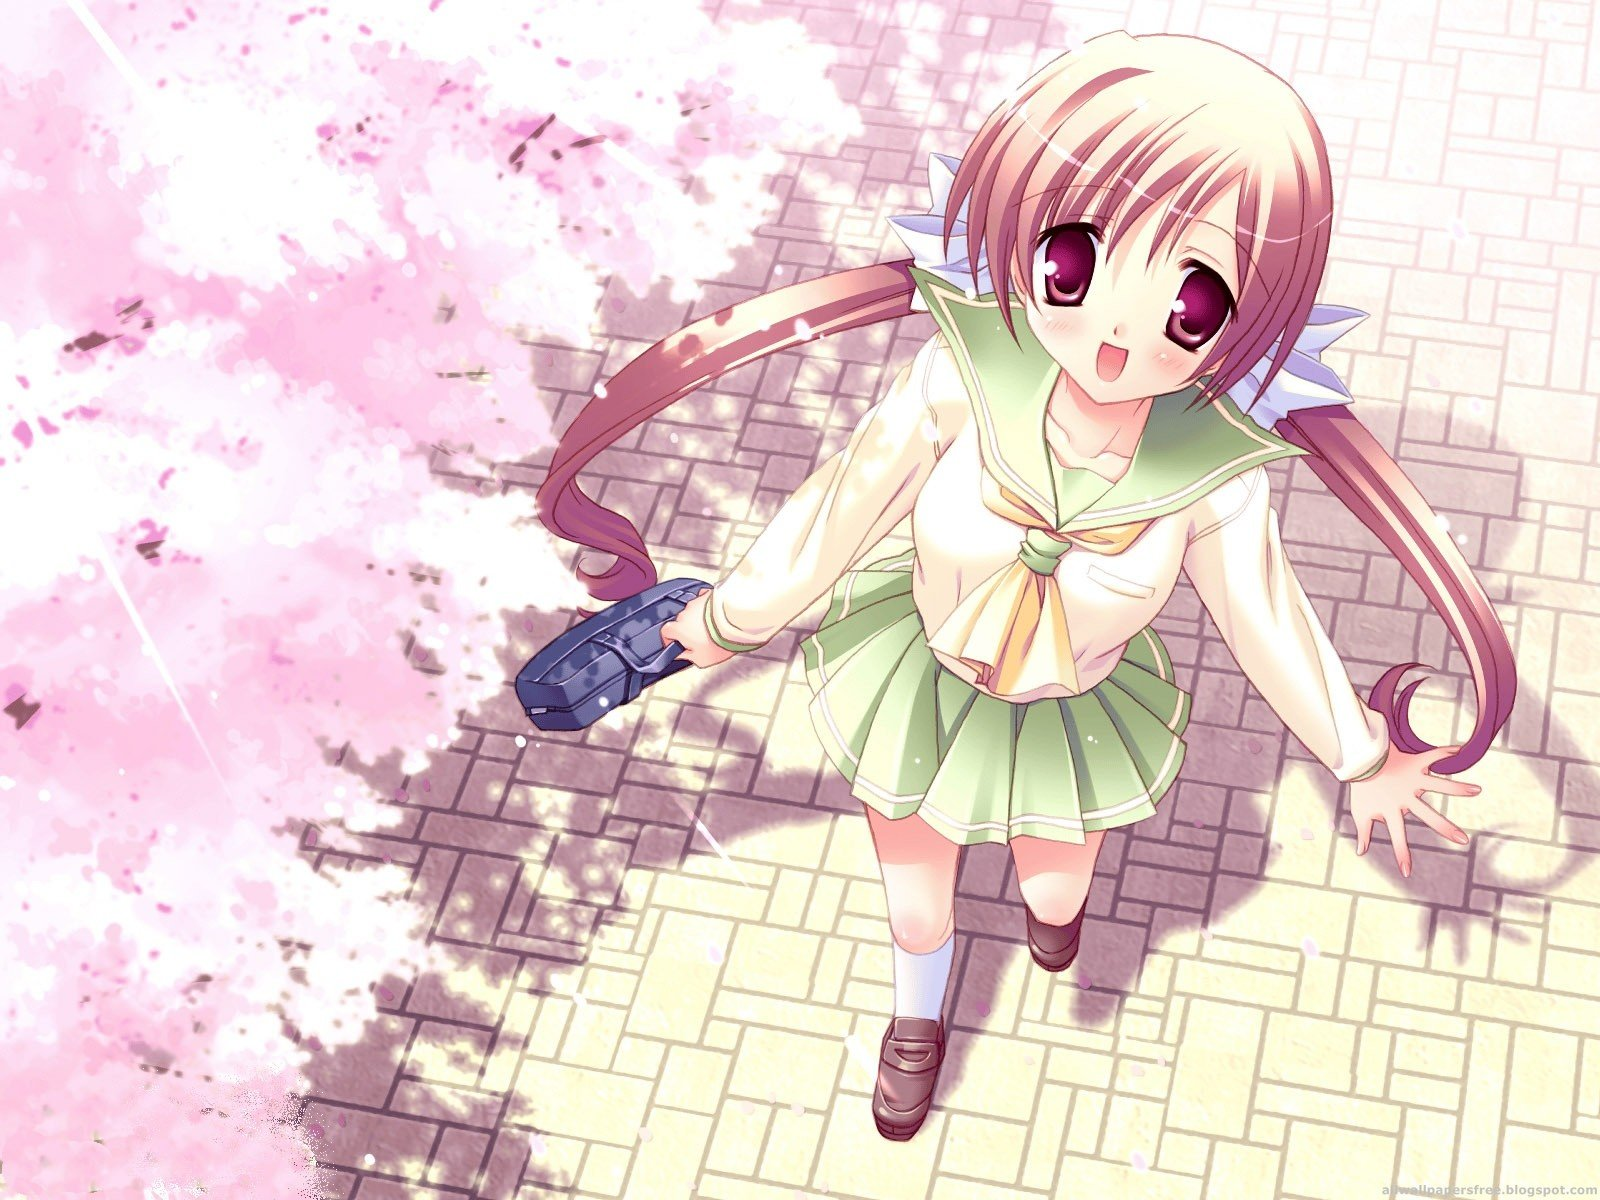 Cherry Blossoms Wallpaper 1600x1200 Cherry Blossoms School Uniforms 1600x1200